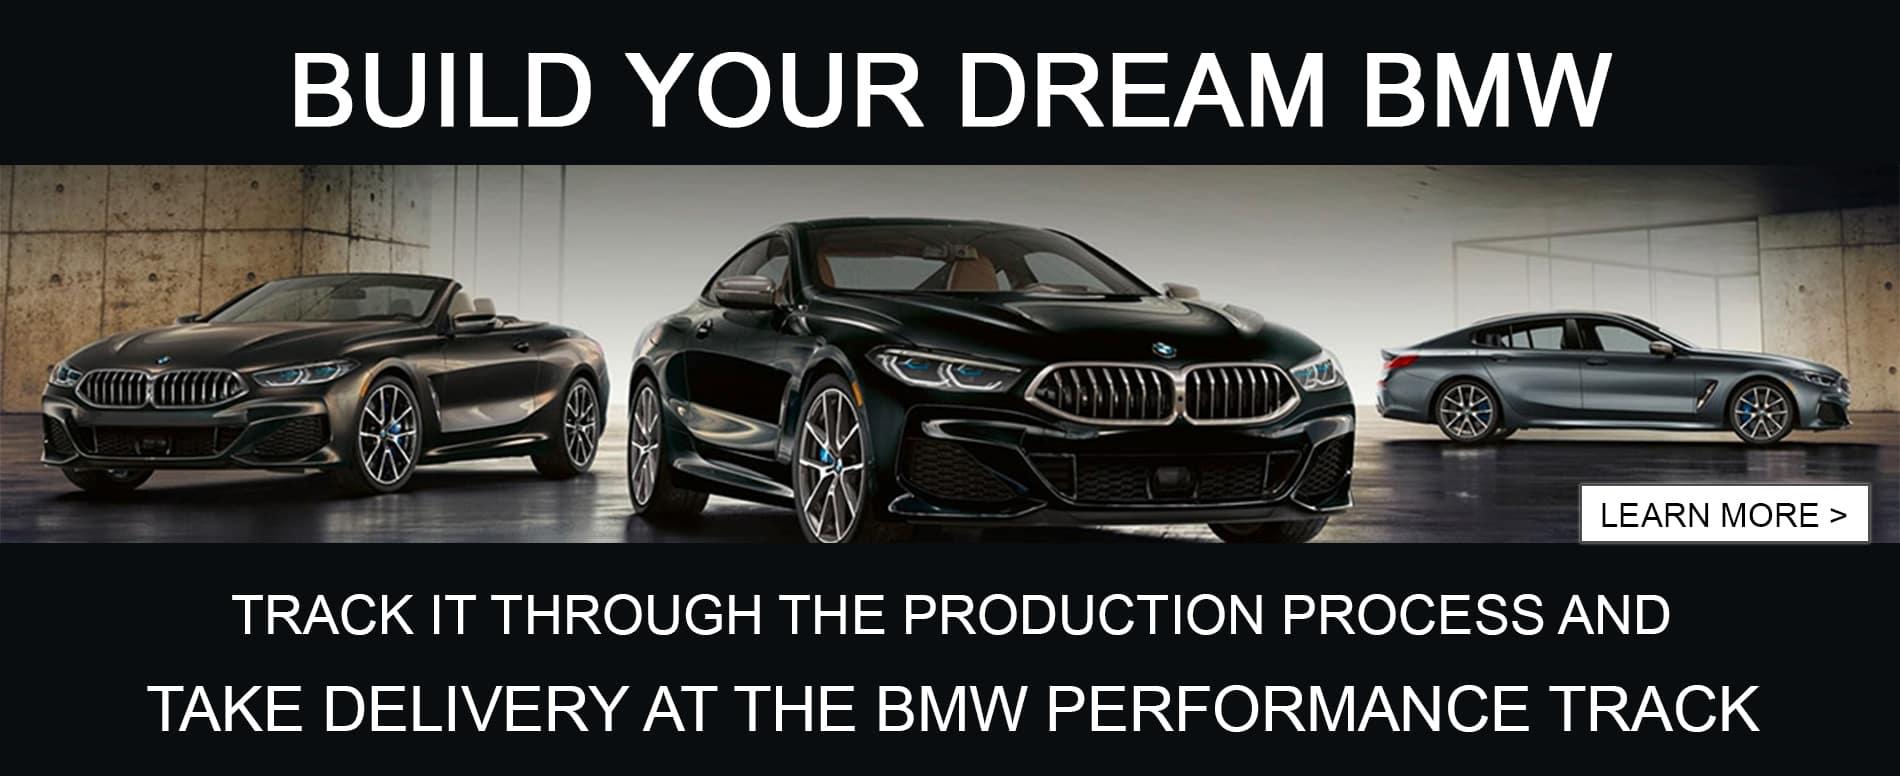 dark 2021 new BMWs build your dream car